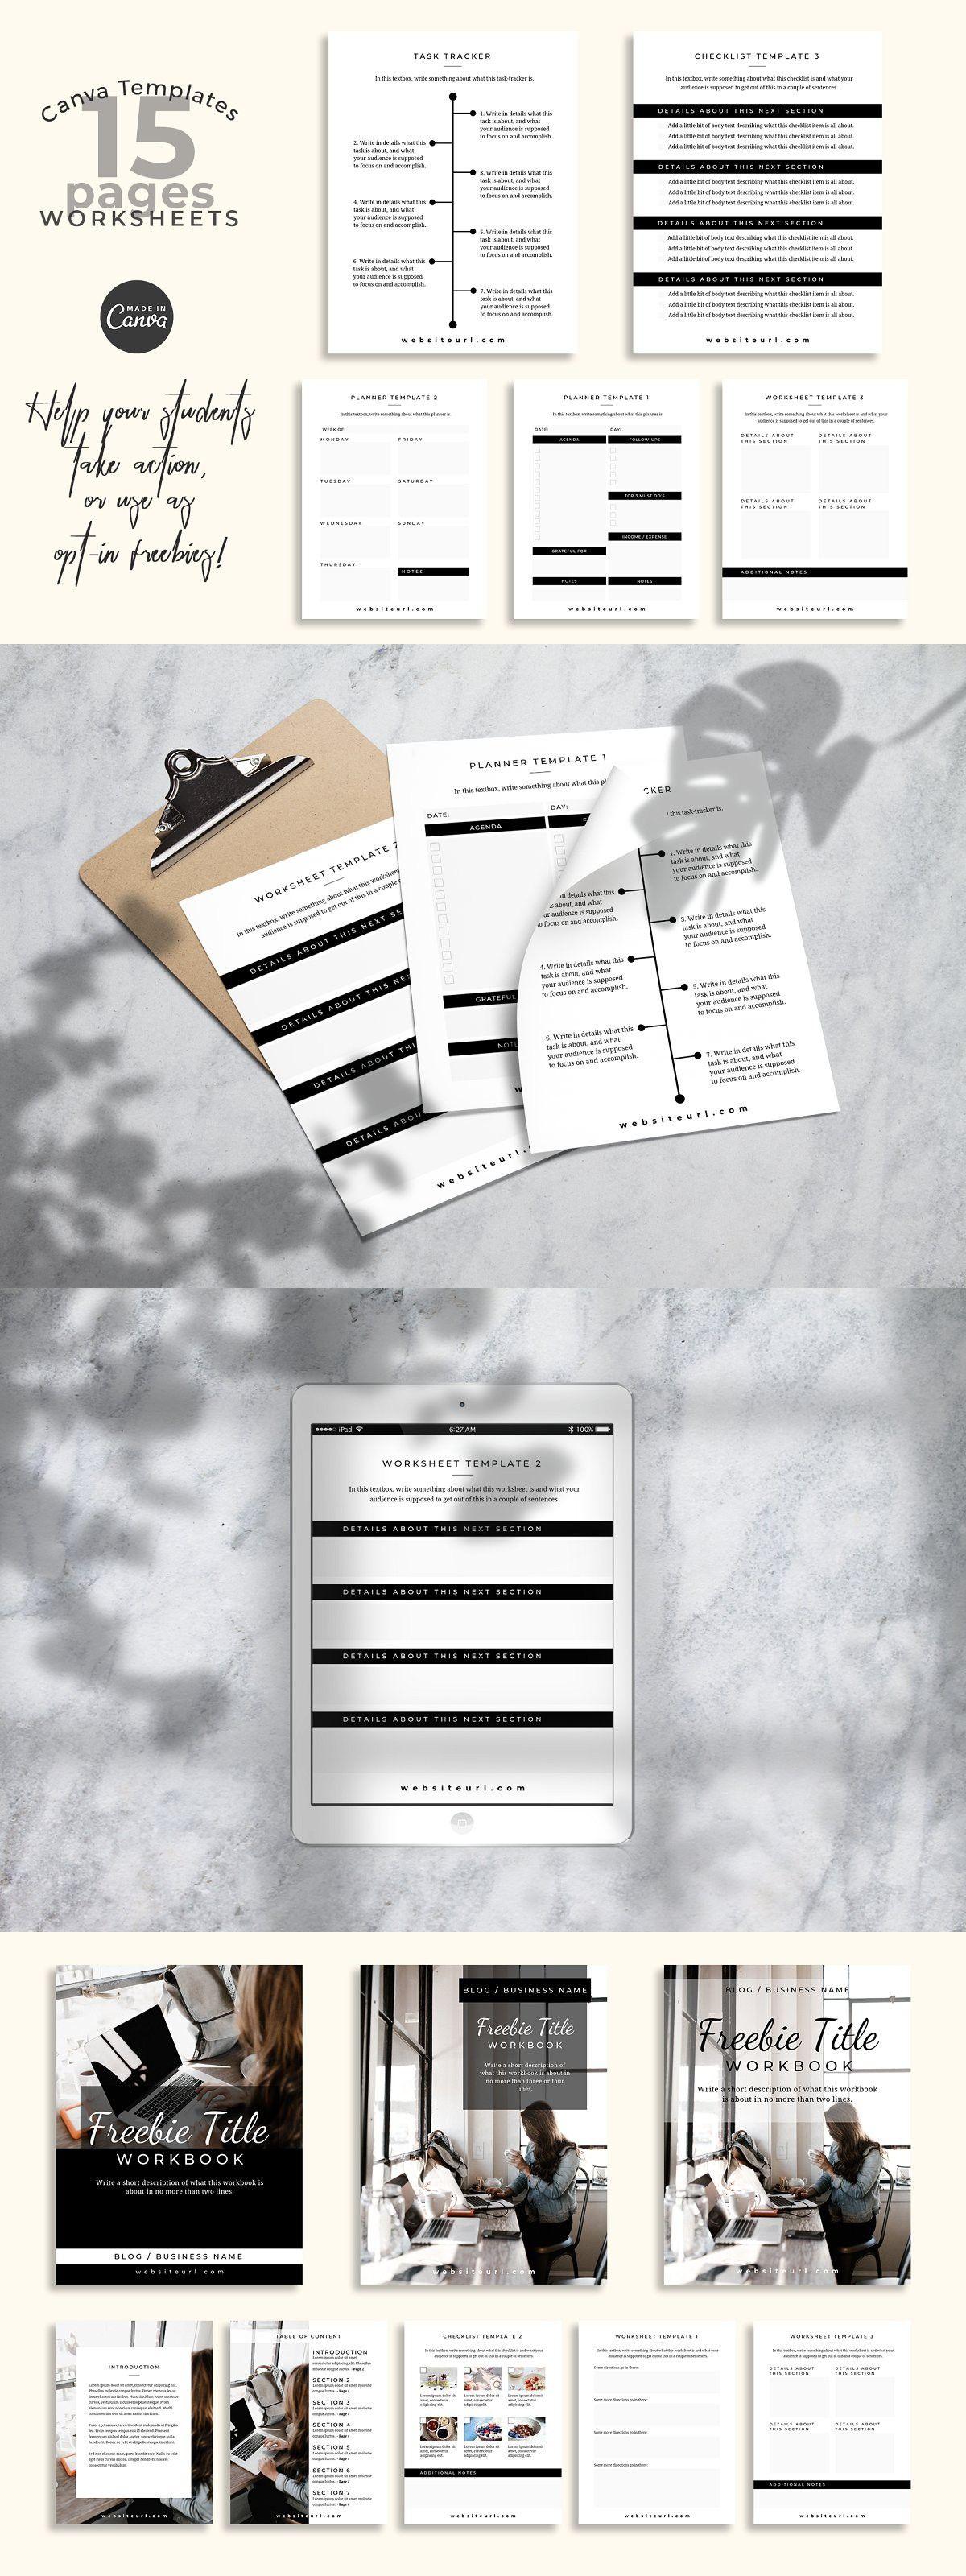 Workbook Canva Templates (Montana) in 2020 Workbook